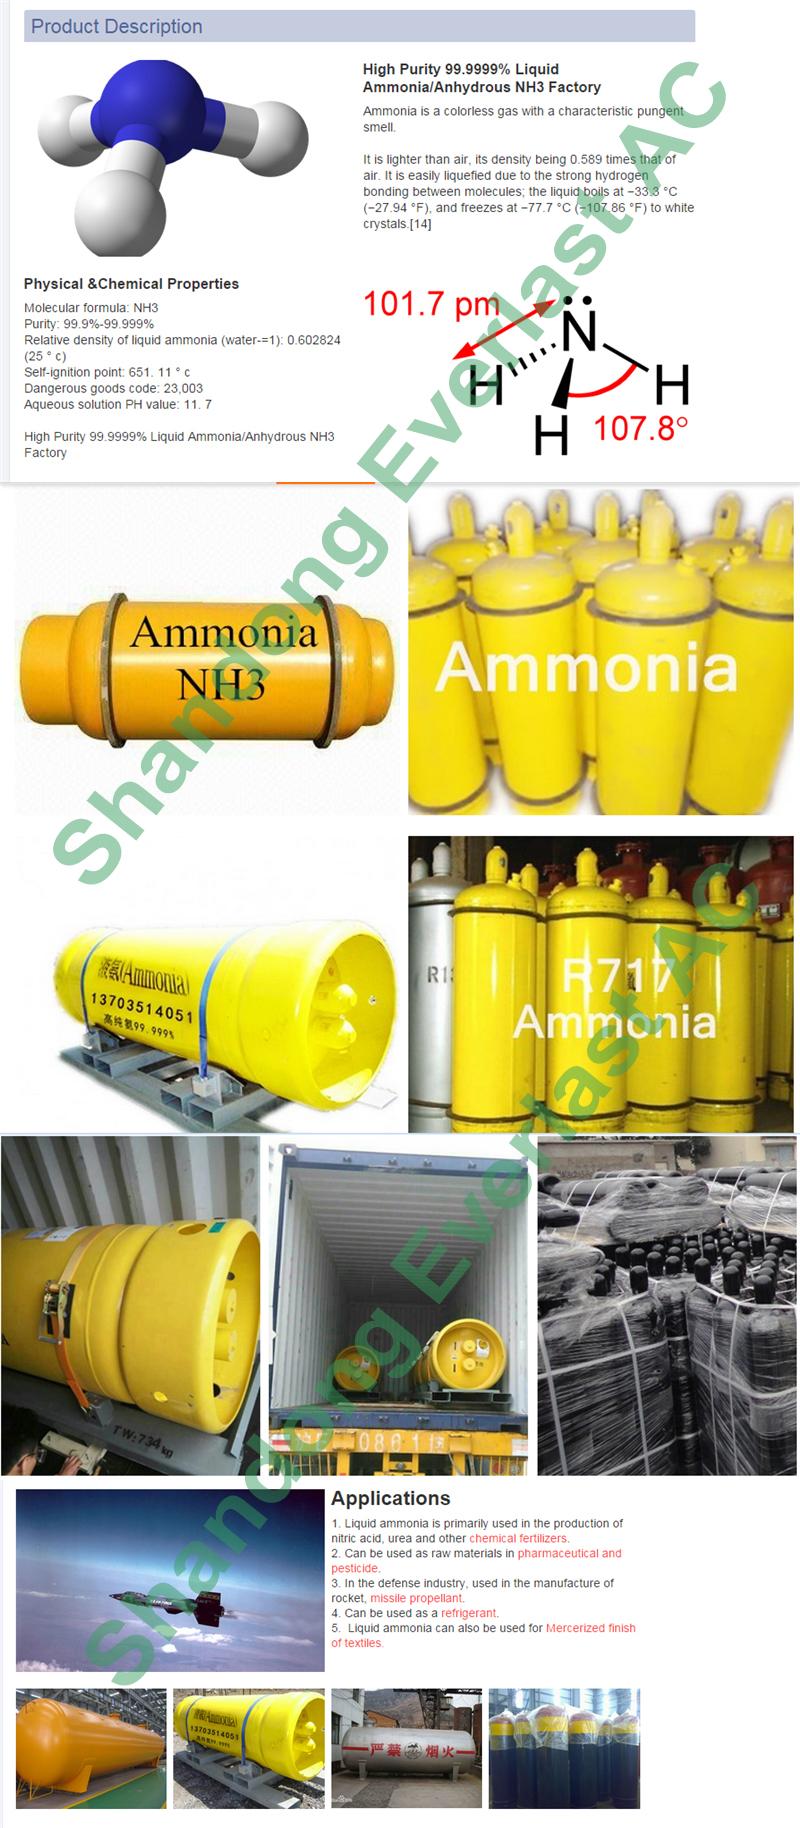 product description-1AMMONIA